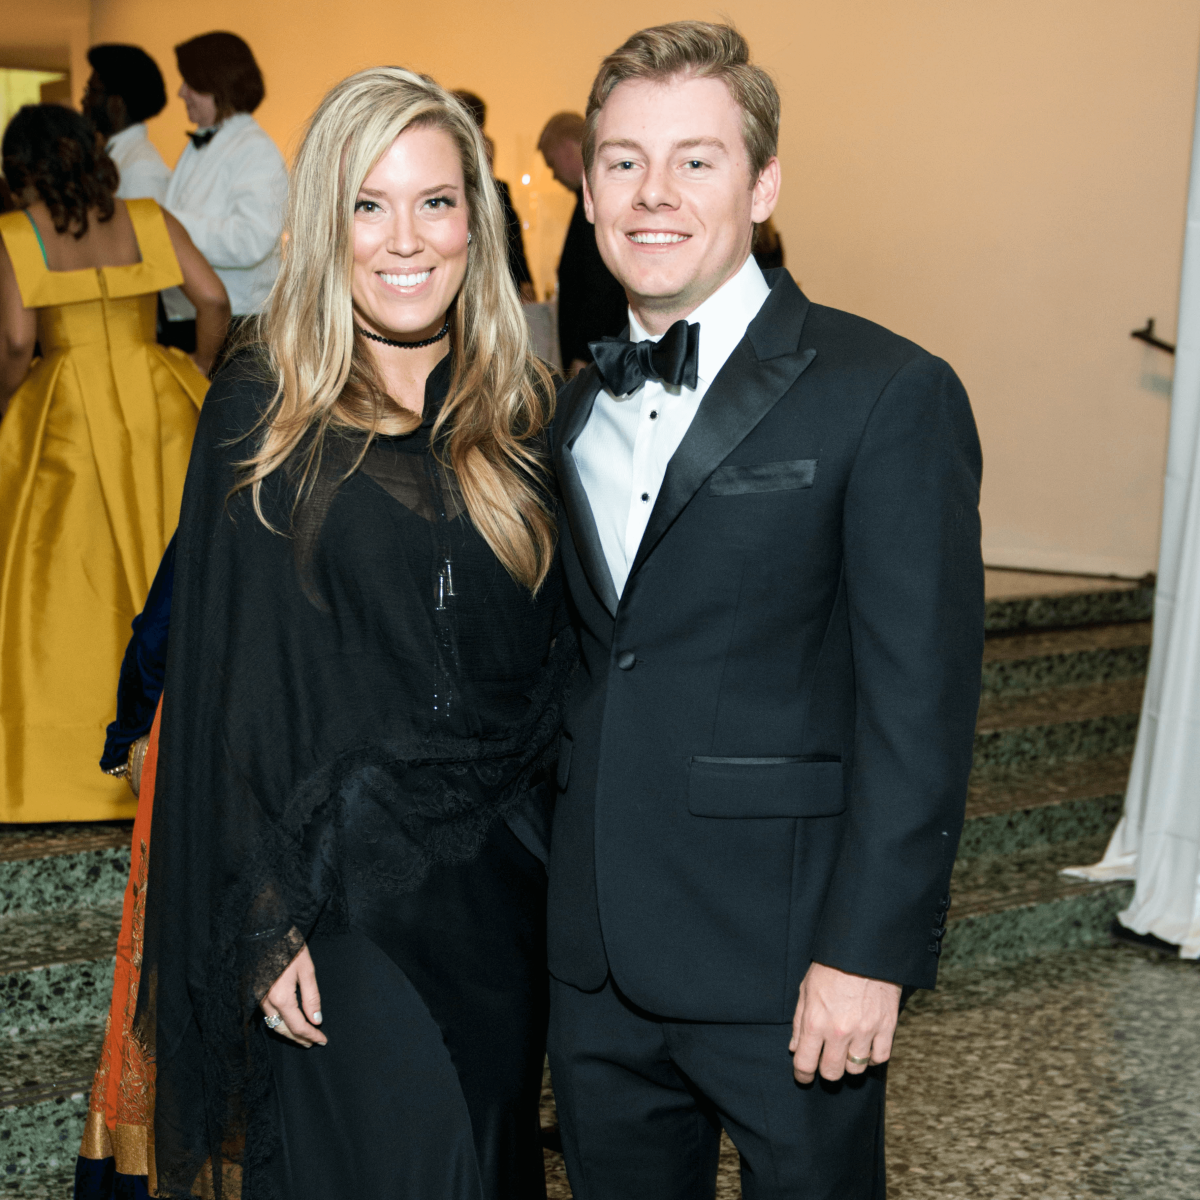 Austin Alvis, Holly Alvis at Museum of Fine Arts Grand Gala